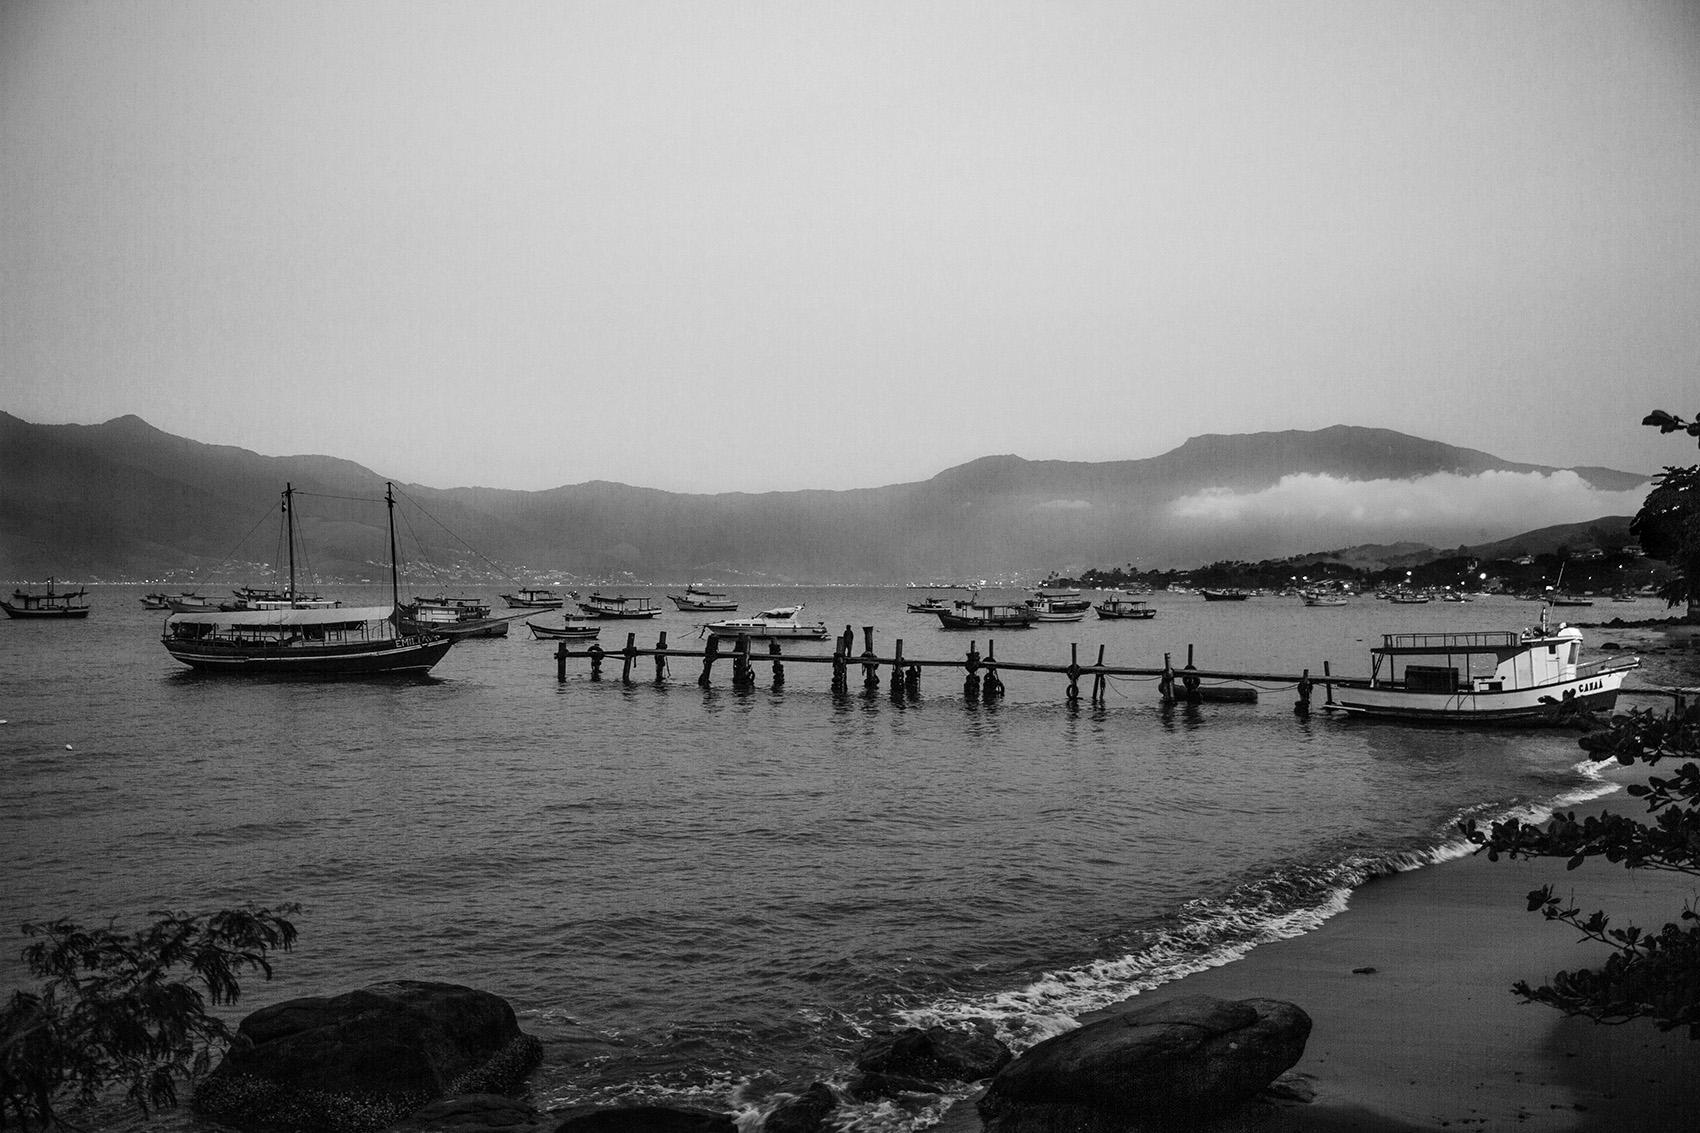 Pier - SP - Brasil